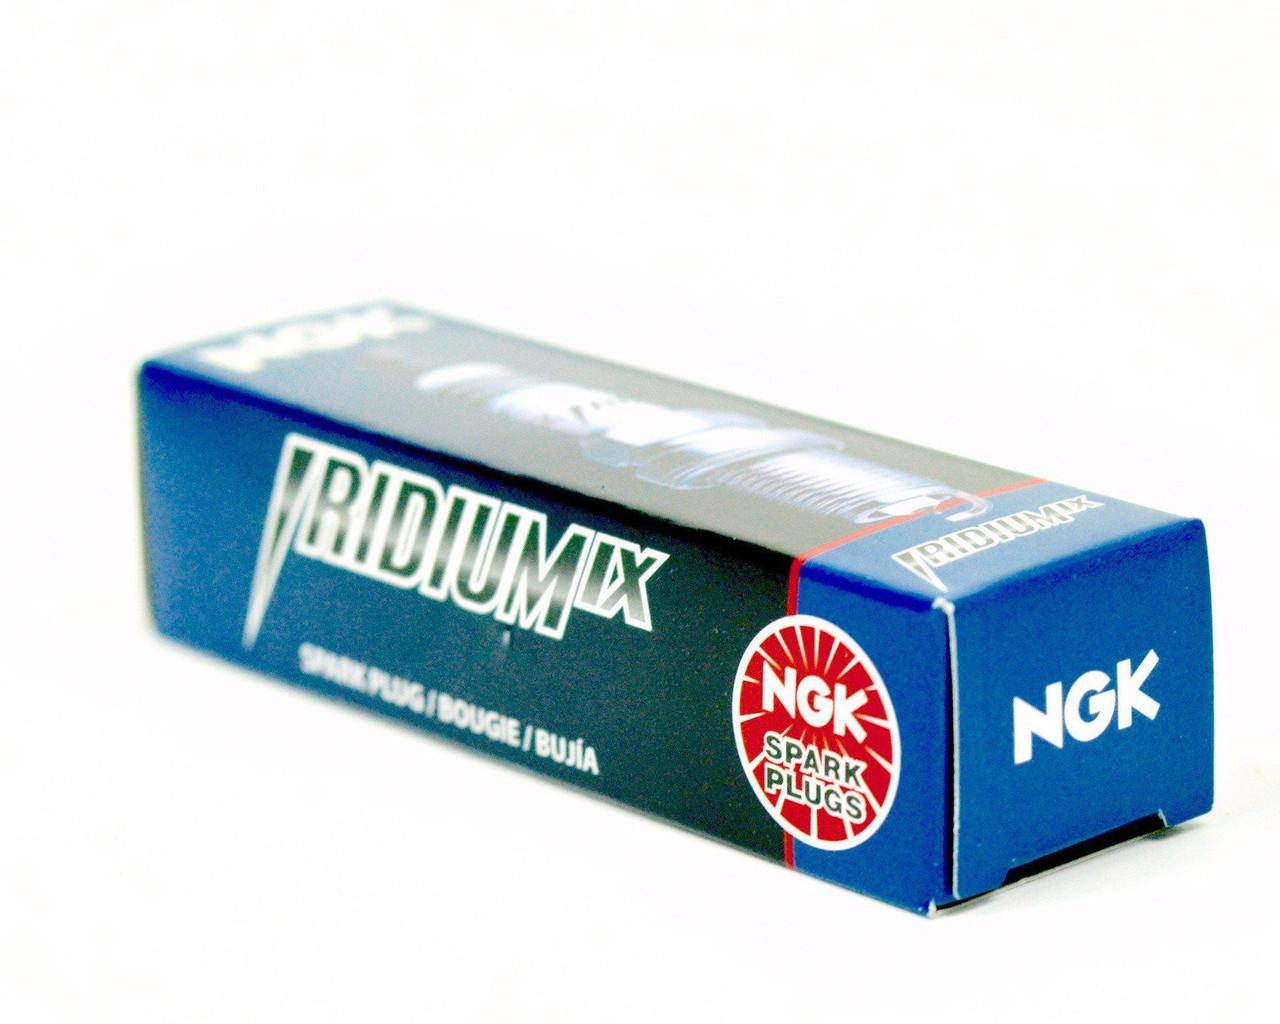 NGK High Performance Spark Plug